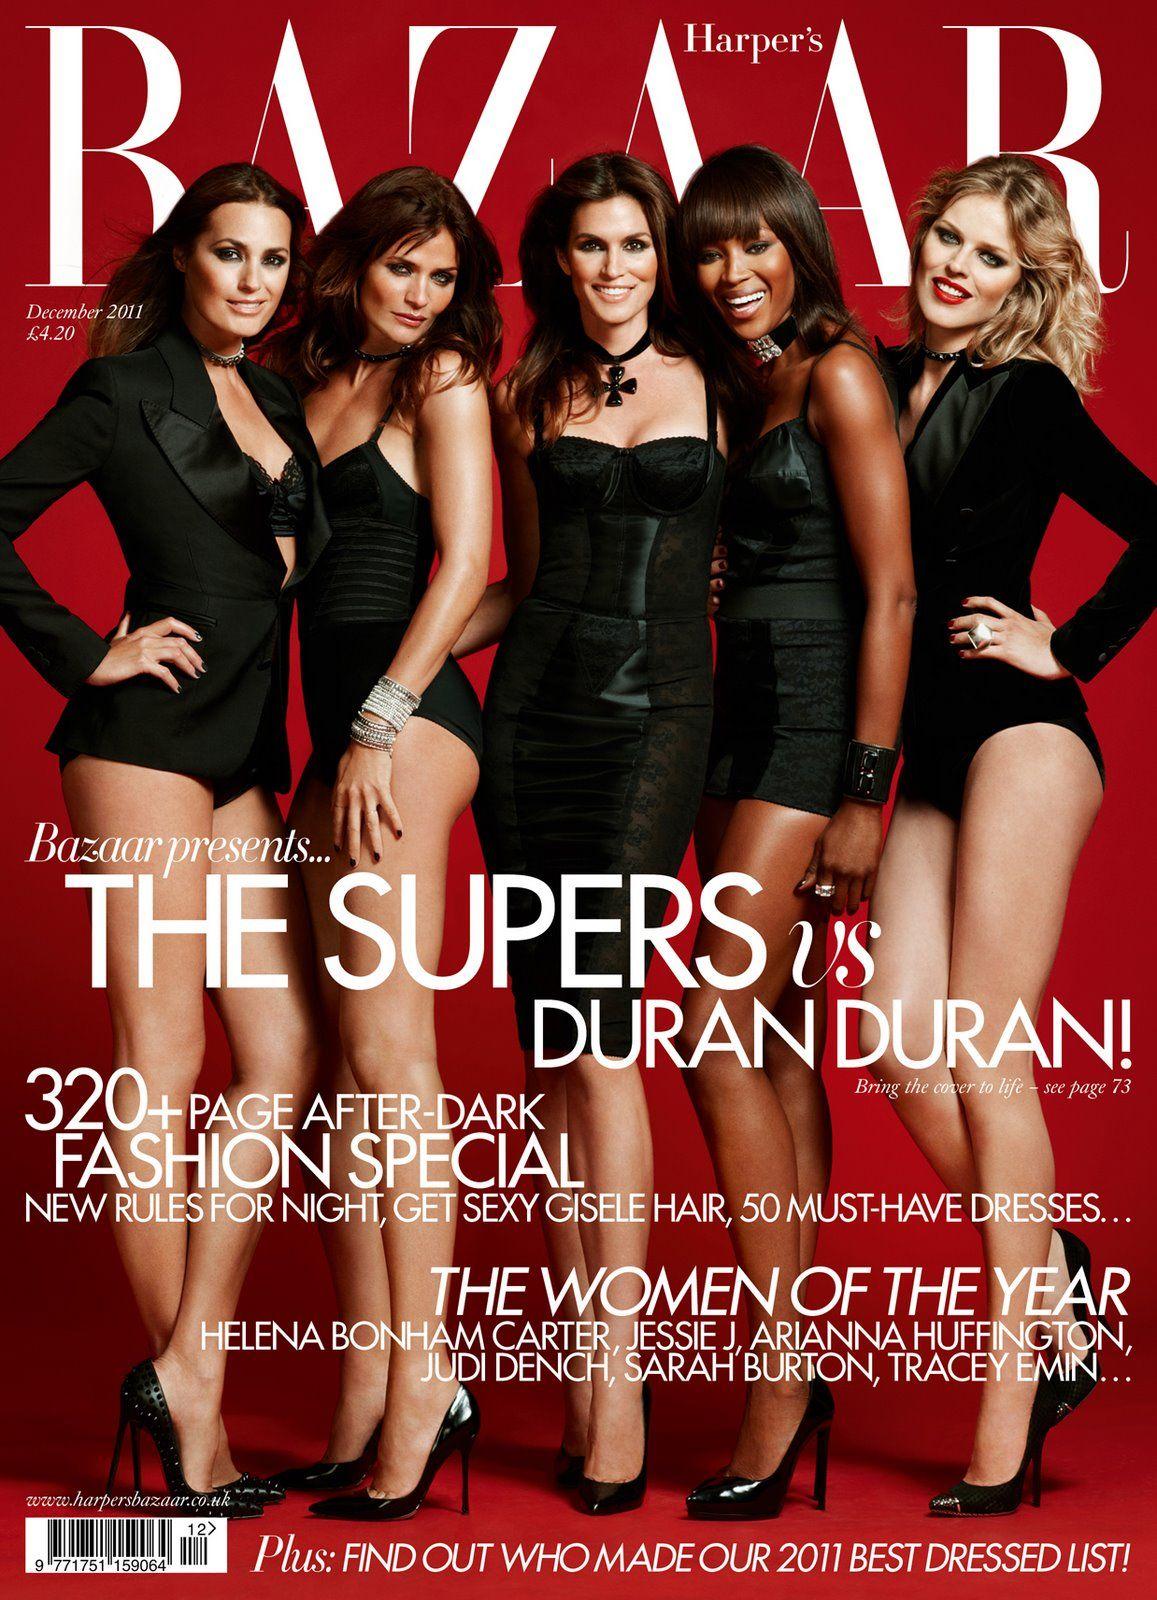 Duran Duran Supermodels Supermodelos Producciones De Moda Top